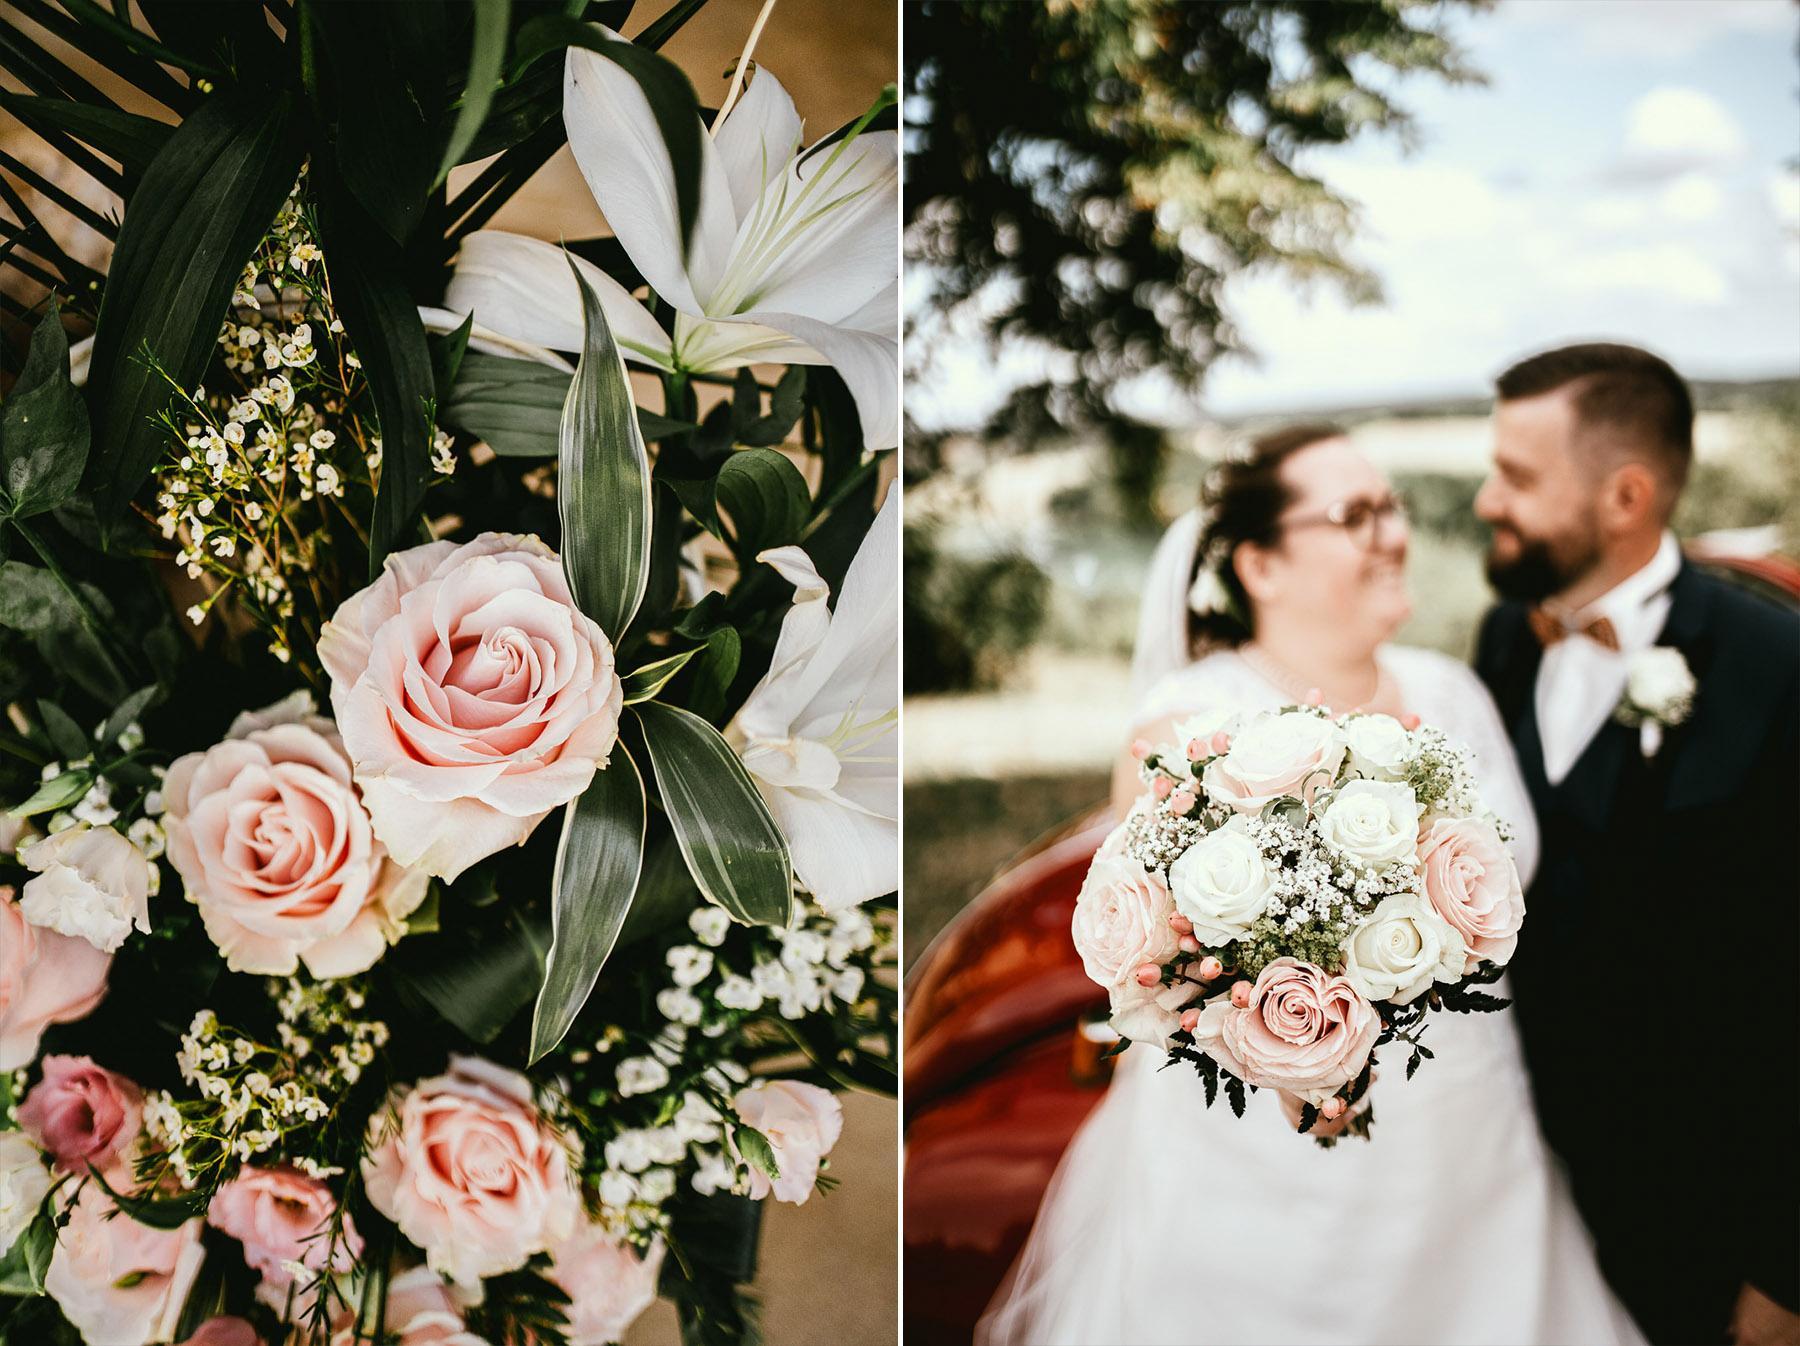 Mariage landes photographe fleuriste